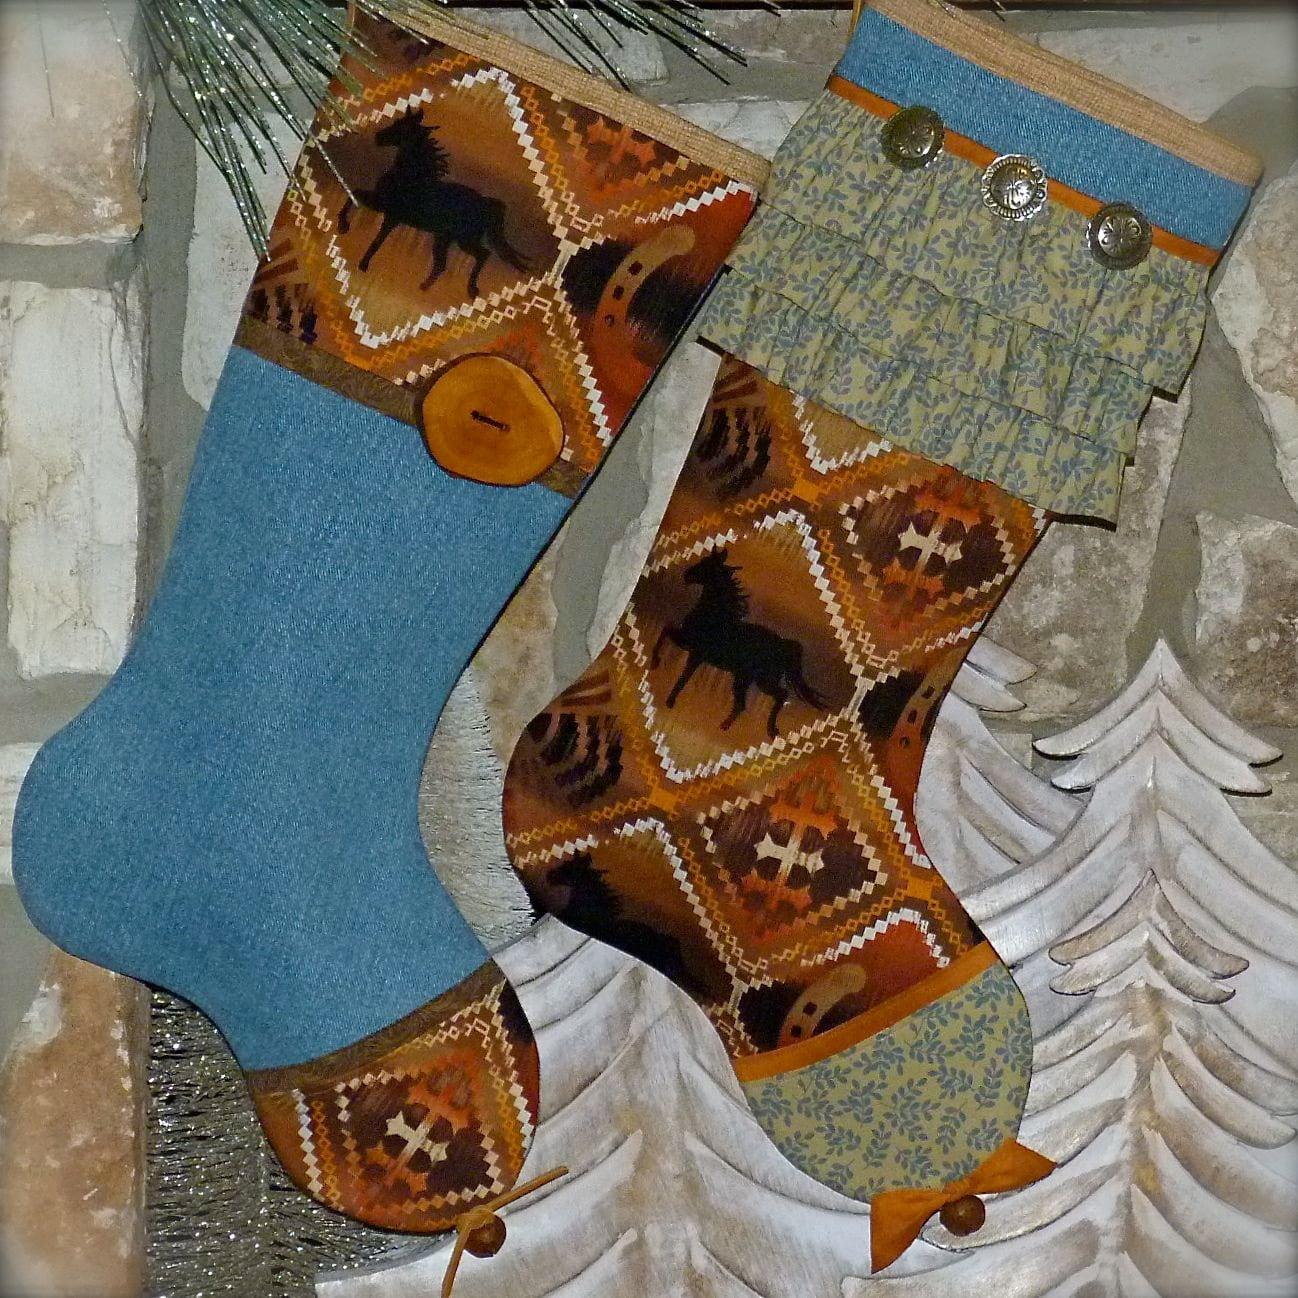 His And Hers Christmas Stockings Cowboy Christmas